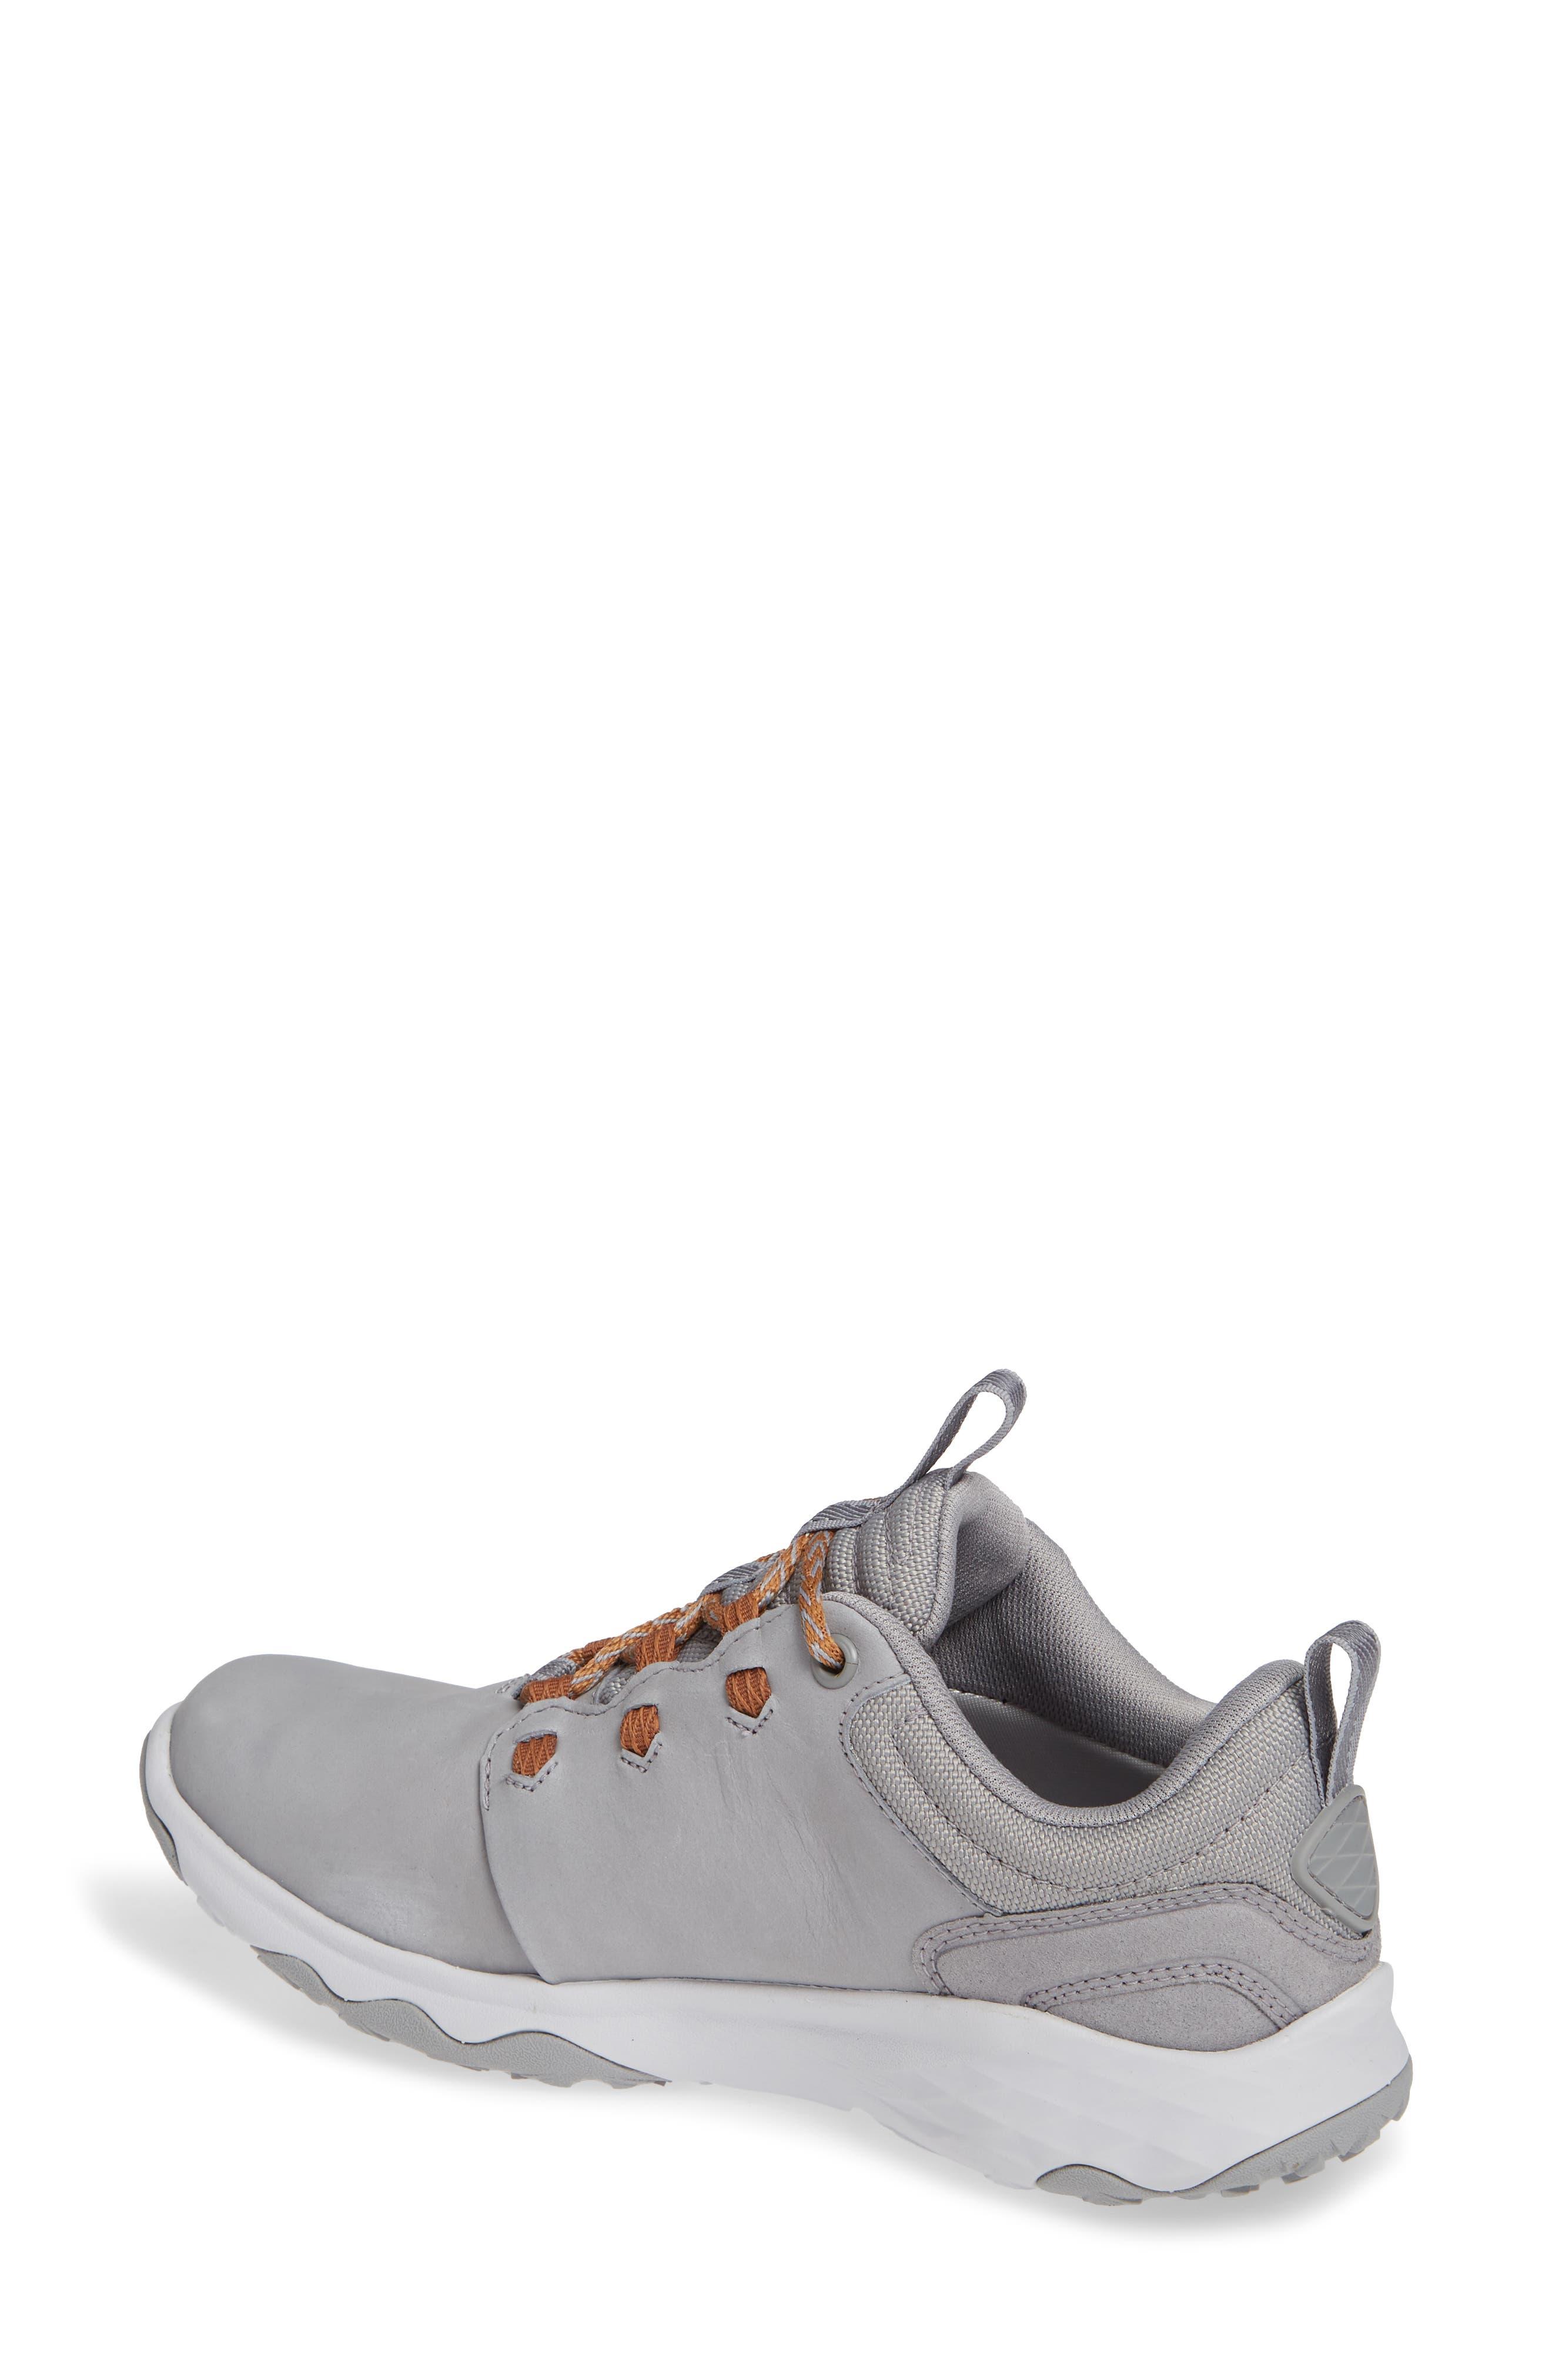 'Arrowood' Waterproof Sneaker,                             Alternate thumbnail 2, color,                             WILD DOVE LEATHER